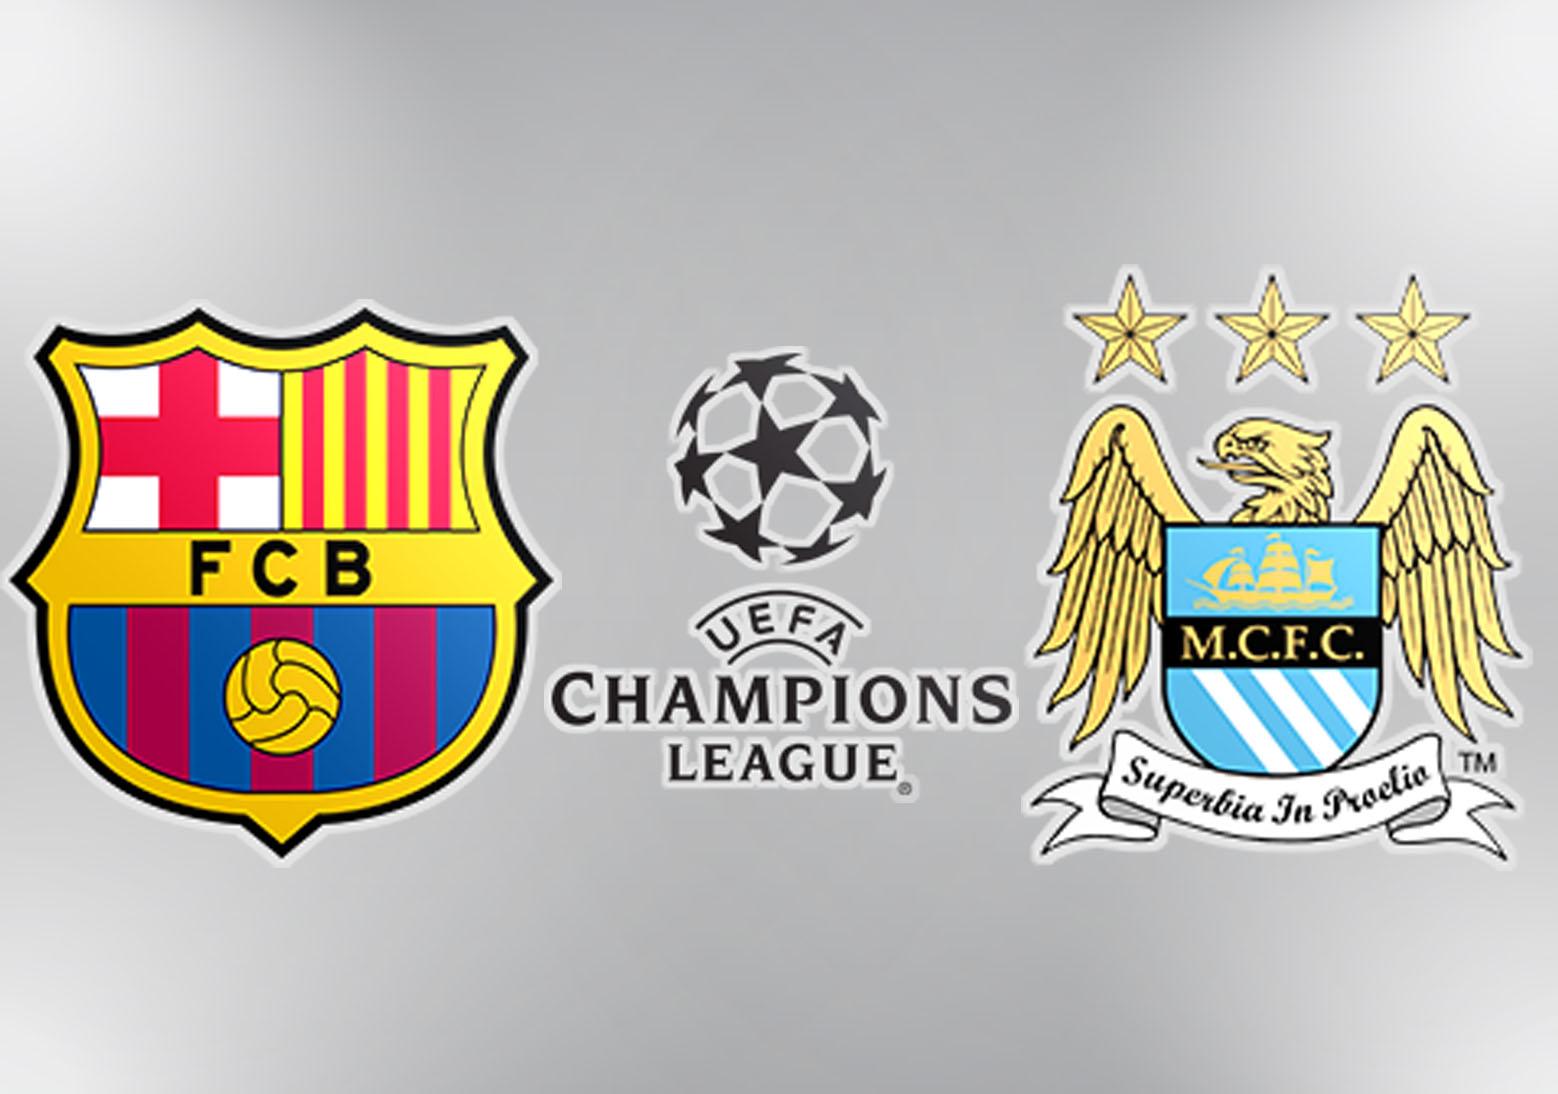 Barcelona Vs Manchester City Logo: Barcelona Vs Manchester City Prediction And Football Tips